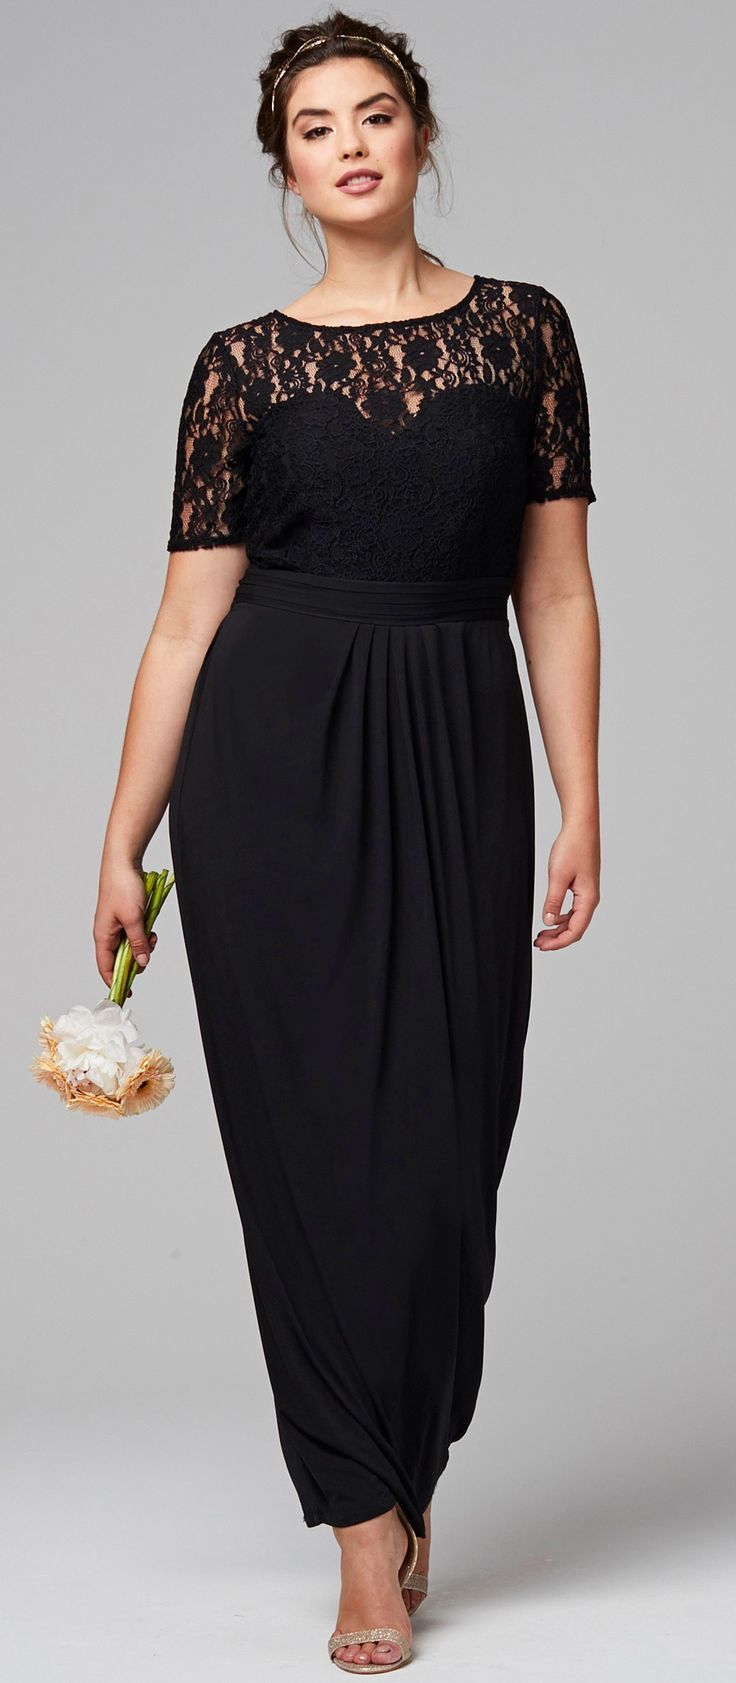 Best 25+ Plus size dresses ideas on Pinterest | Girls plus ...